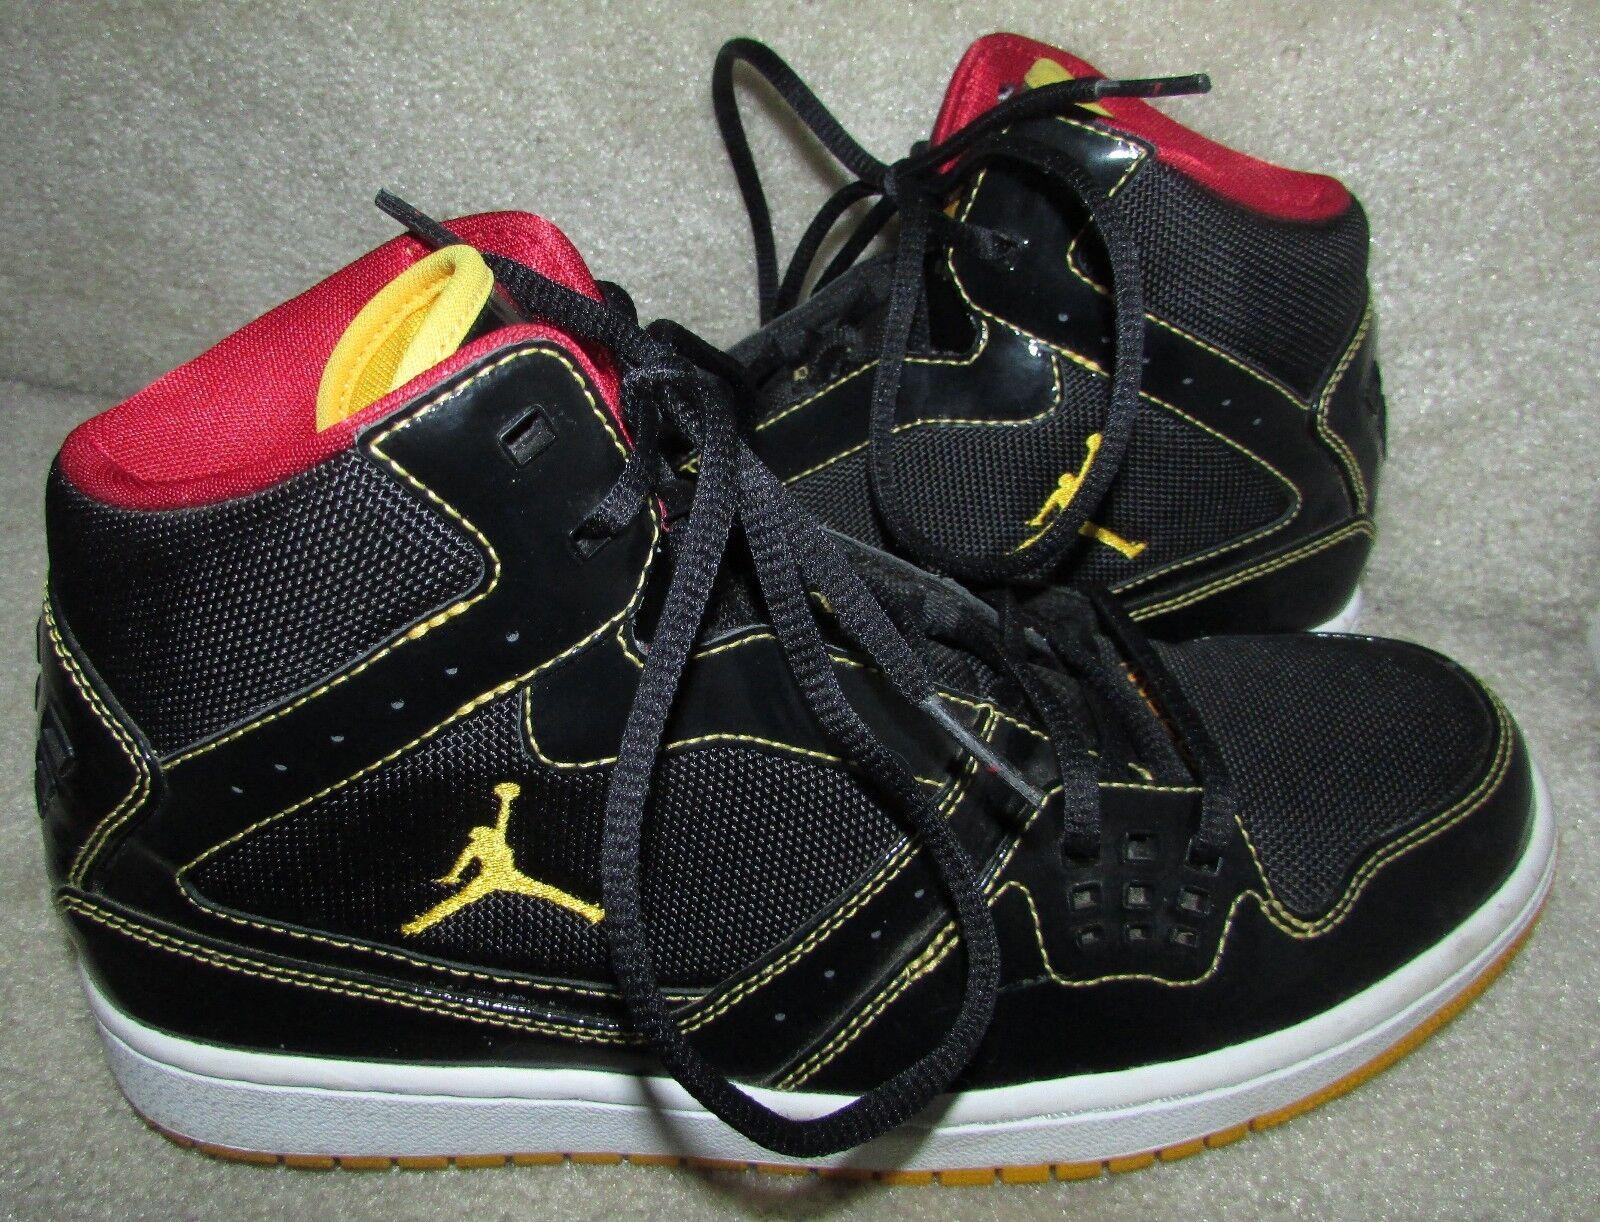 Nike Jordan 1 Flight Mid Samples Basketball shoes Size 9 Black gold Red White EU